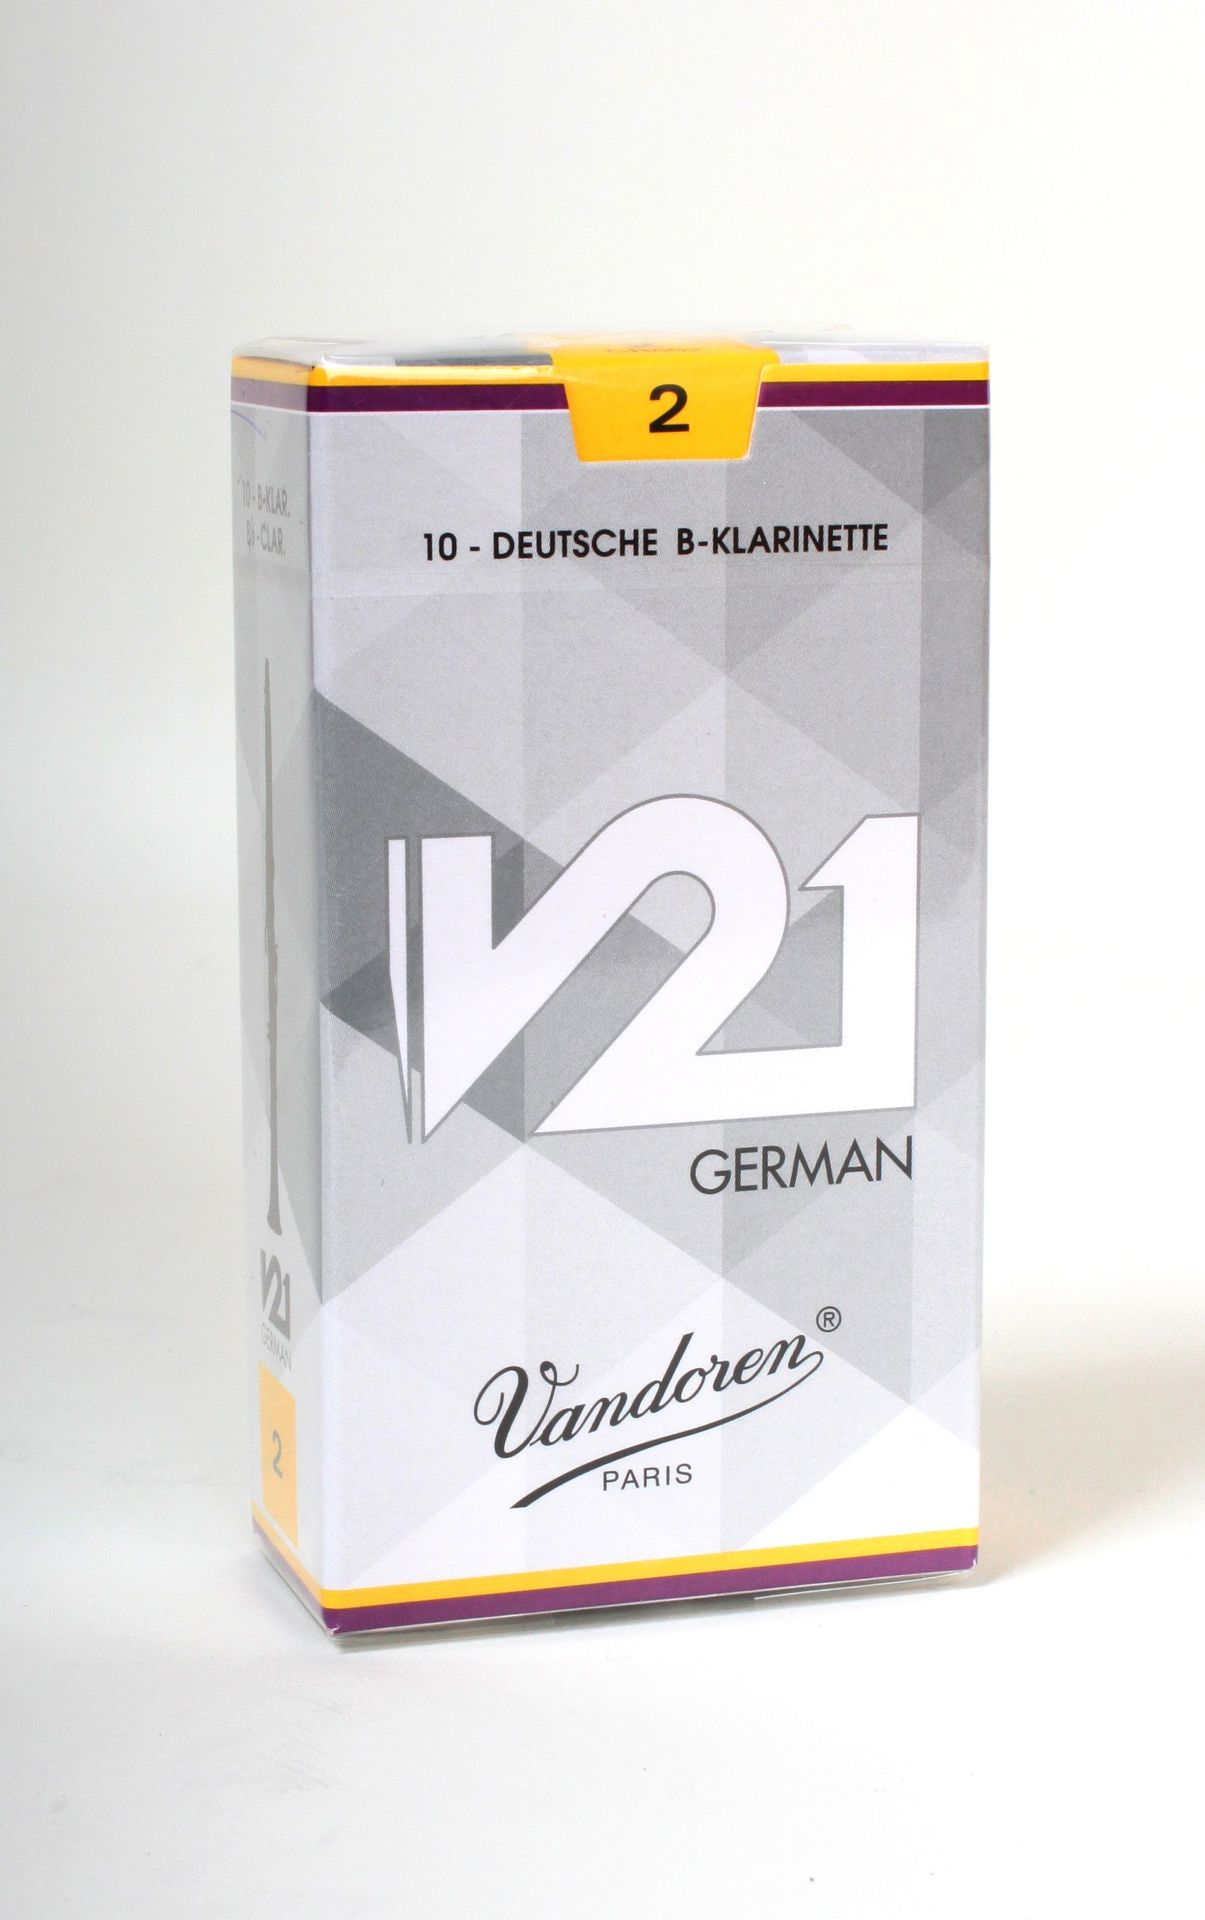 Vandoren V-21 B-Klarinette deutsch 2,0  V21 Blatt